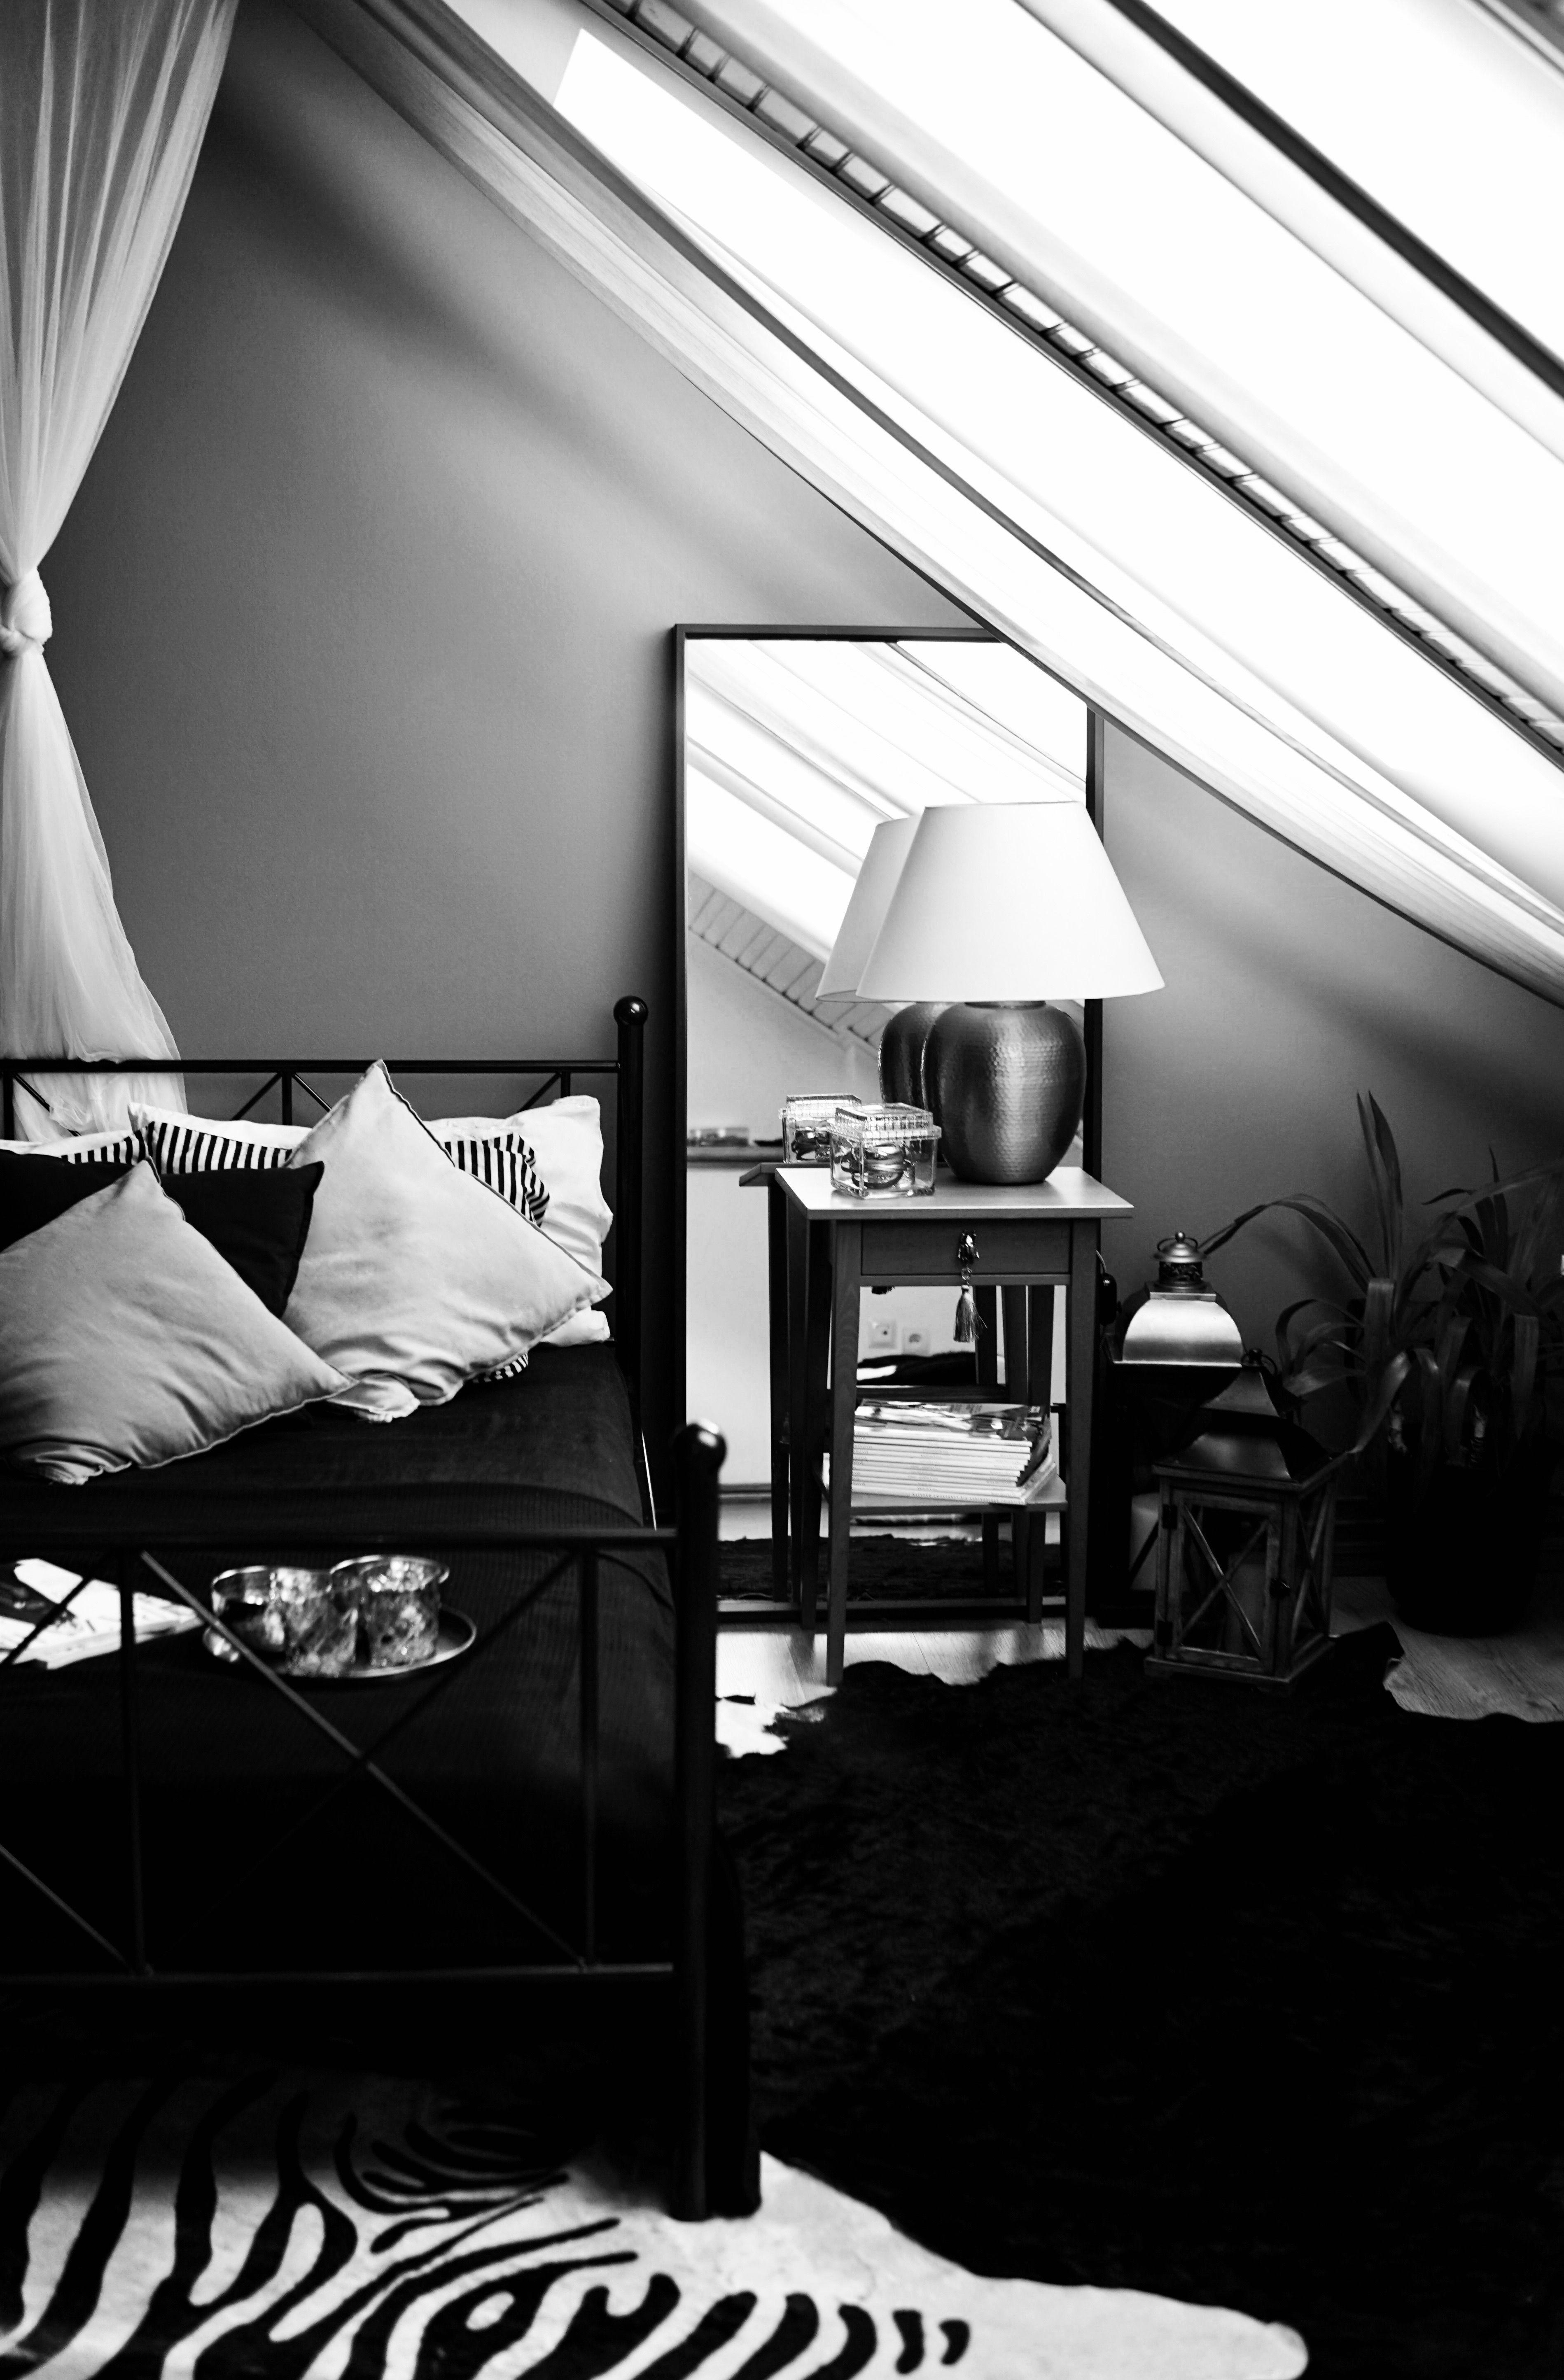 Bedroom Bedroom Ideas For Small Rooms Bedroom On Attic Sypialnia Na Poddaszu To Zawsze Wyzwanie Jednak Odpowiedn Small Room Bedroom Small Rooms Home Decor